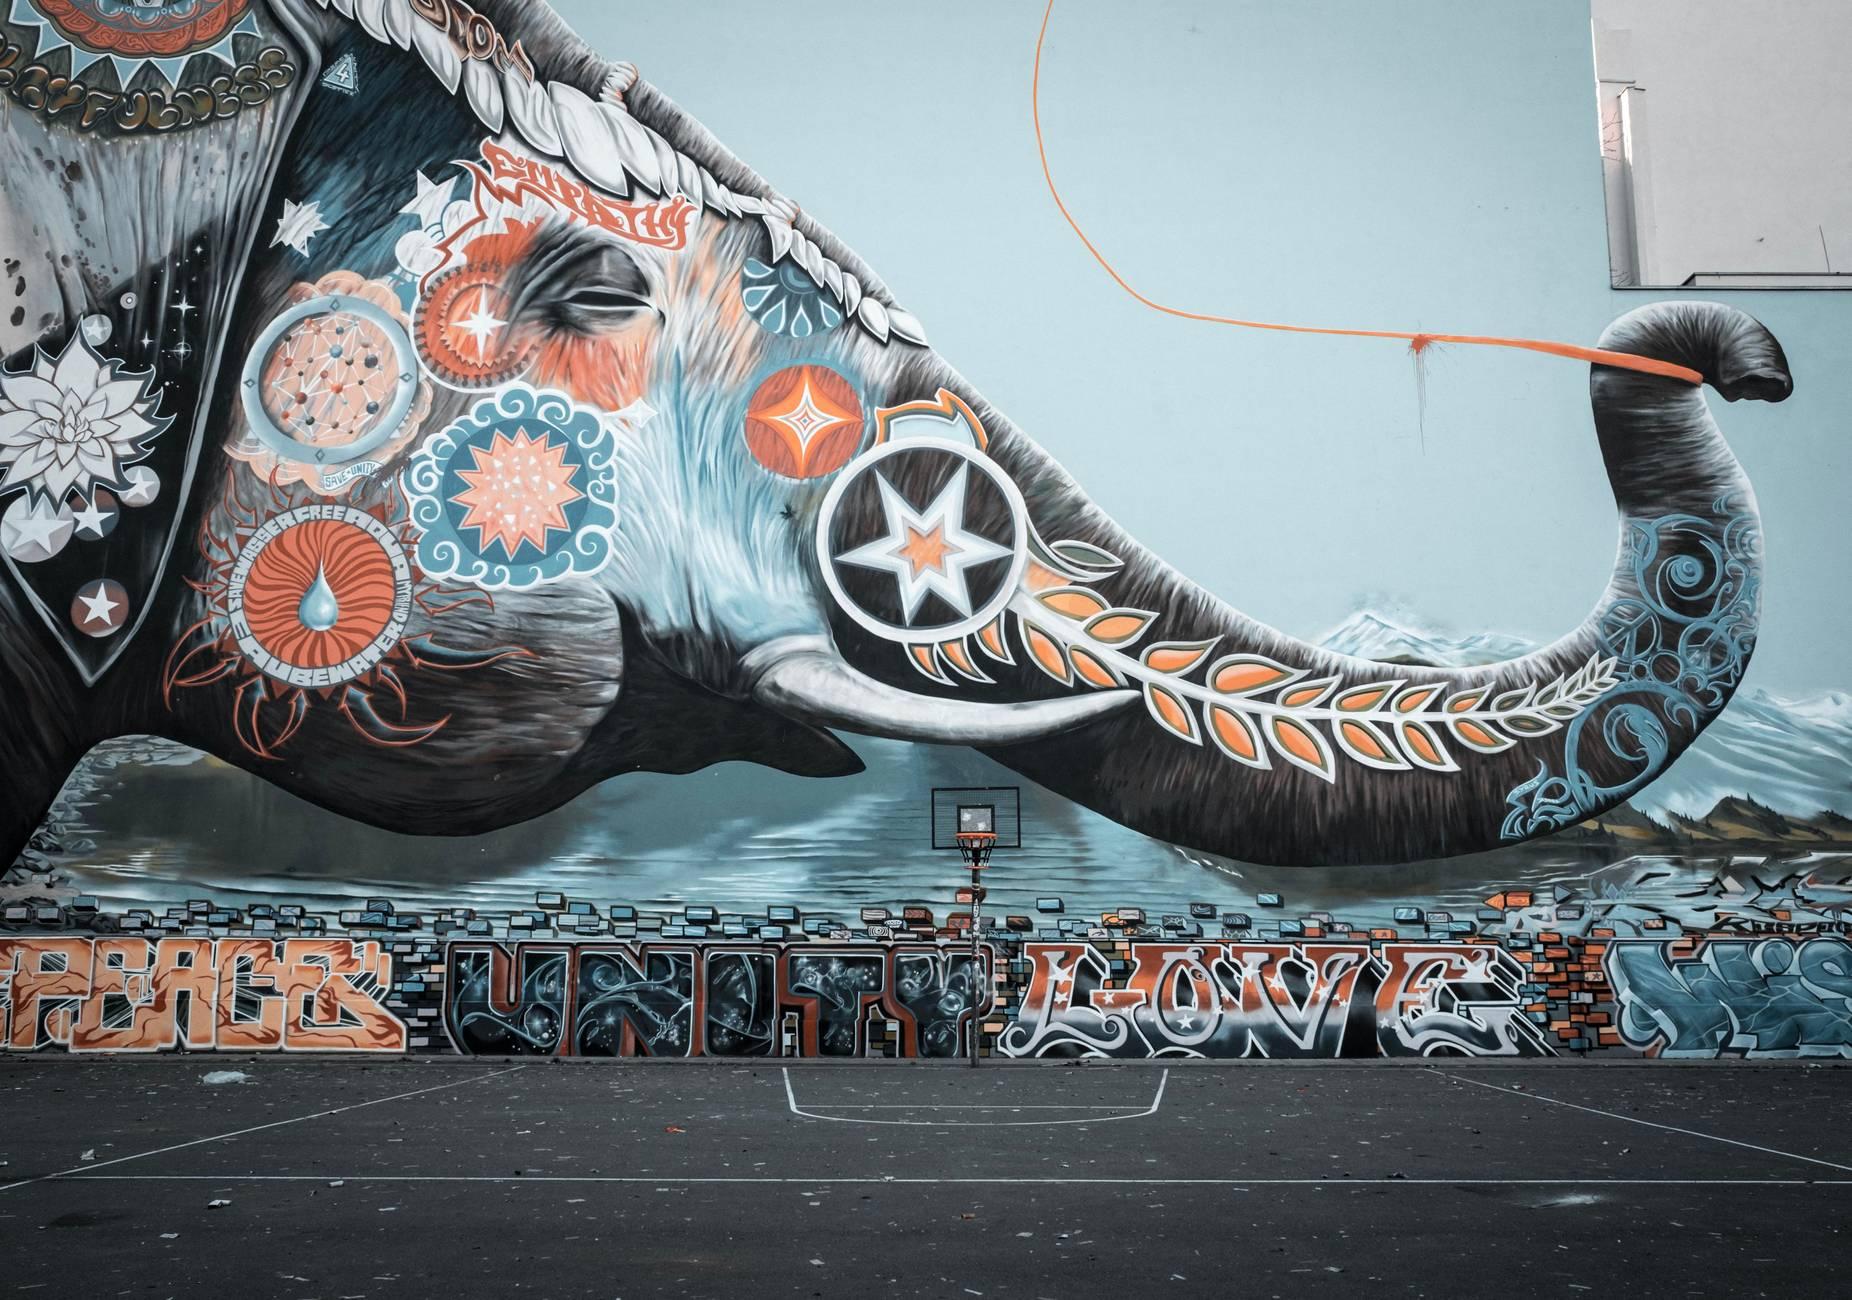 Creative elephant mural